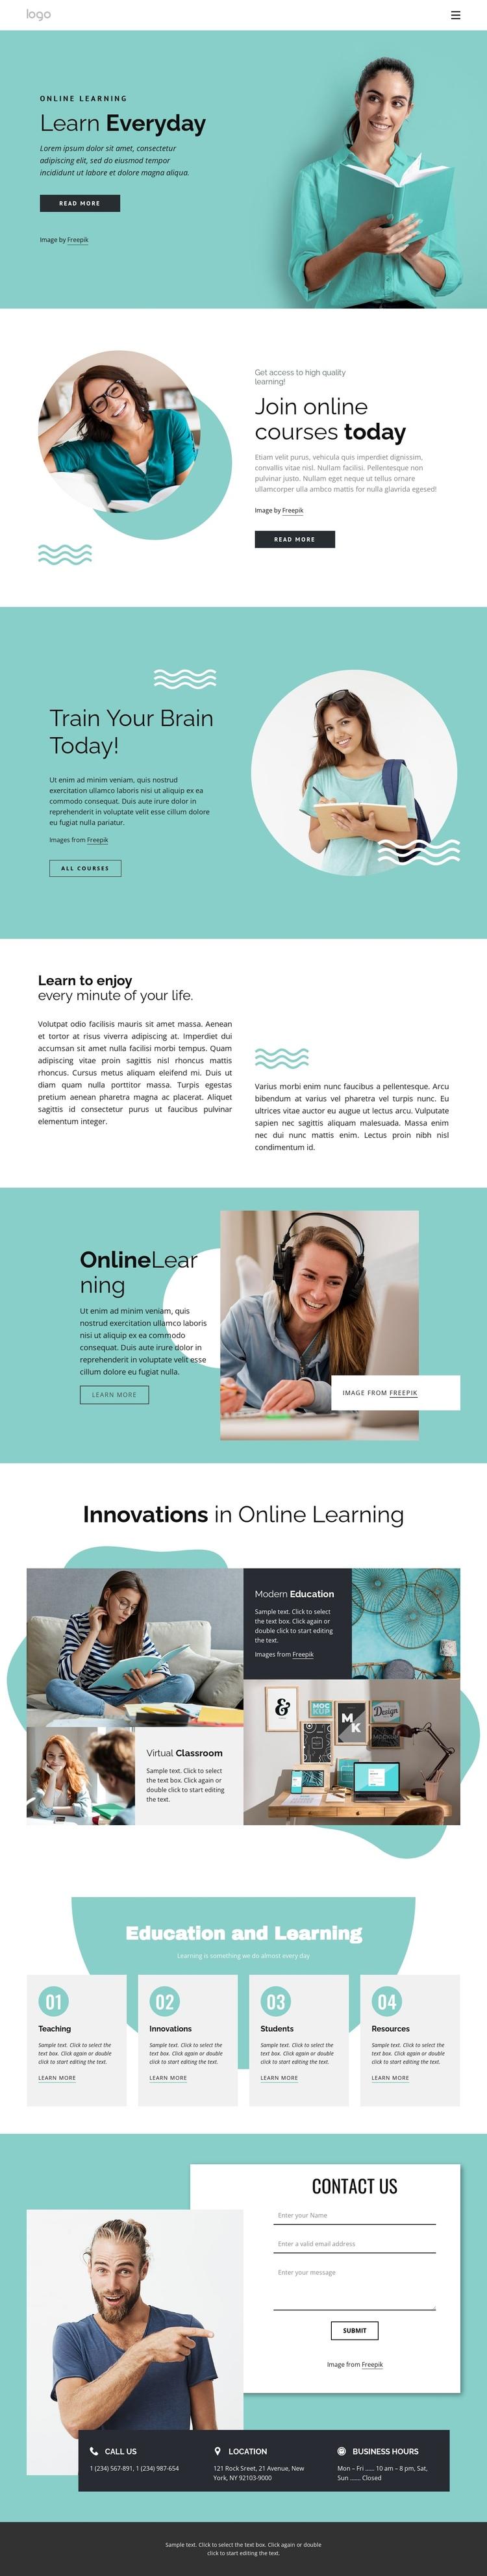 Learning is a lifelong process Website Builder Software